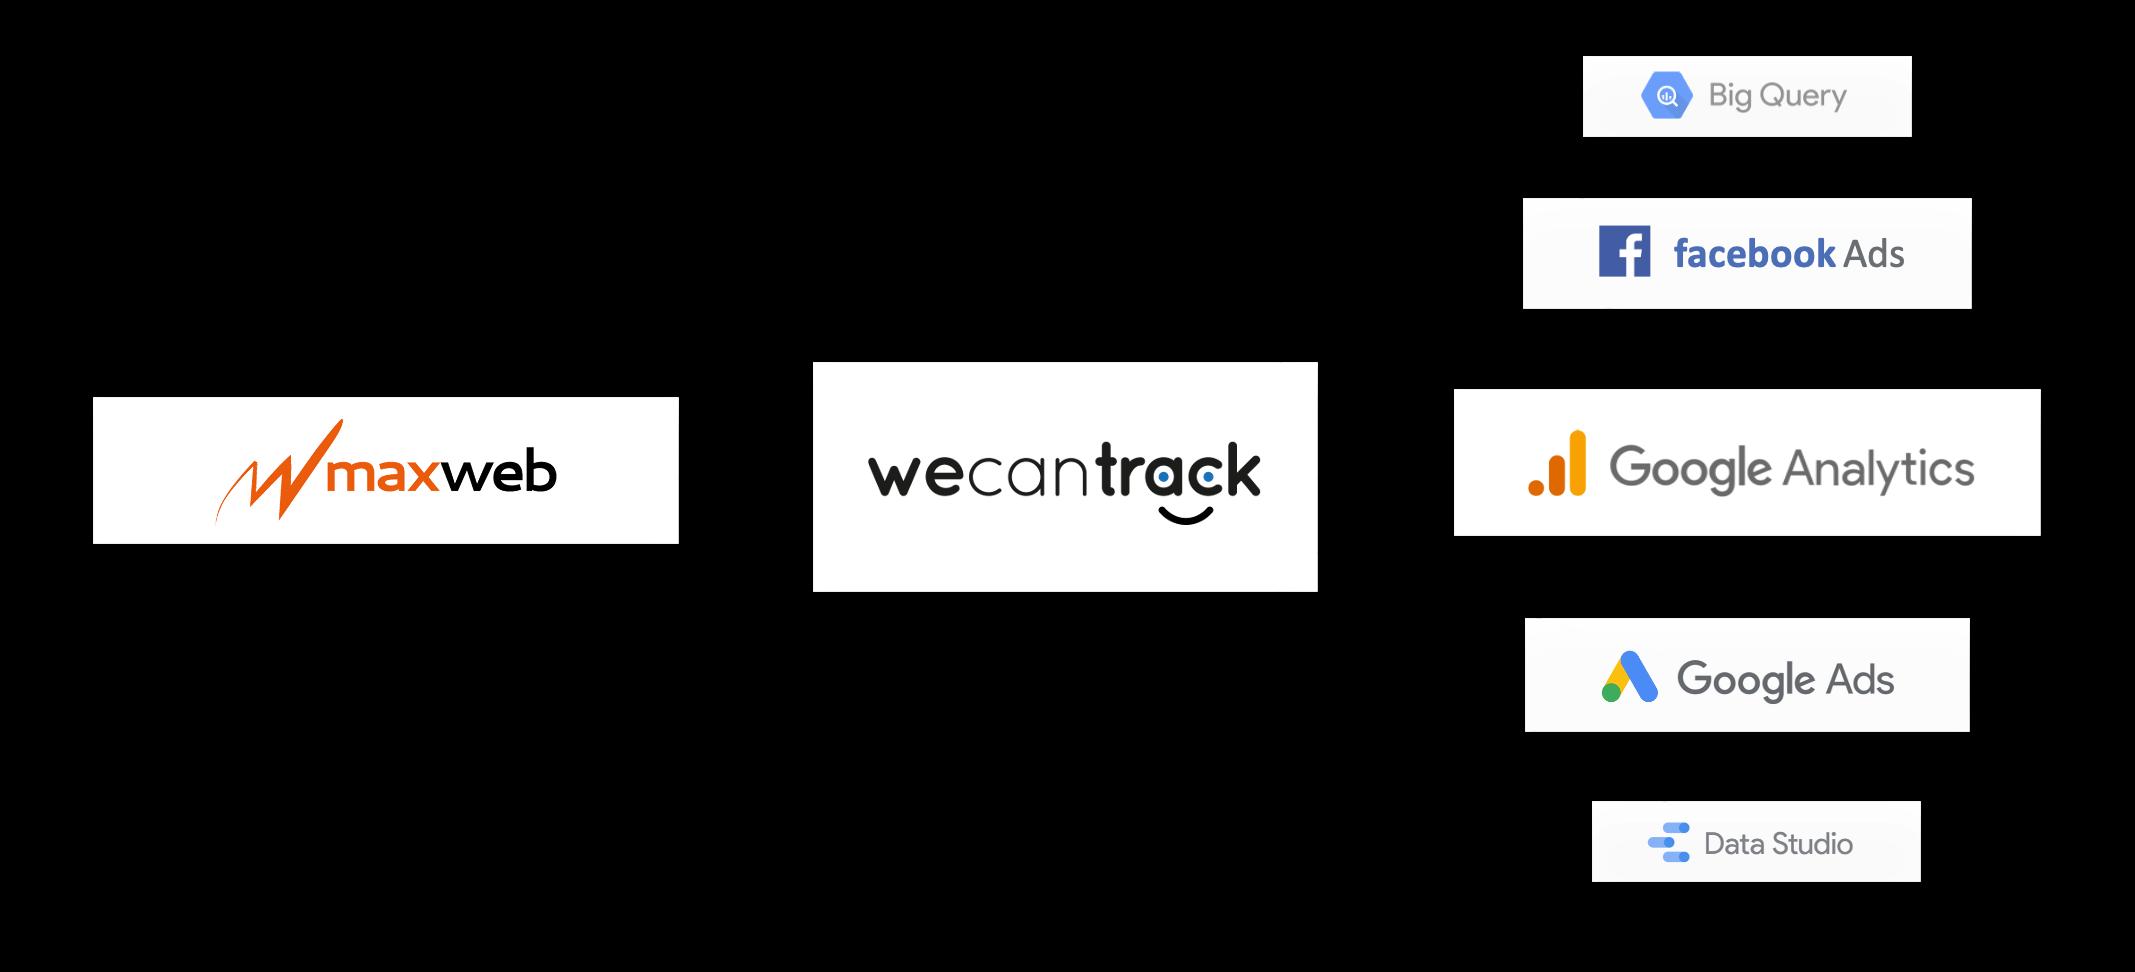 maxweb-affiliate-conversion-integration-via-postback-url